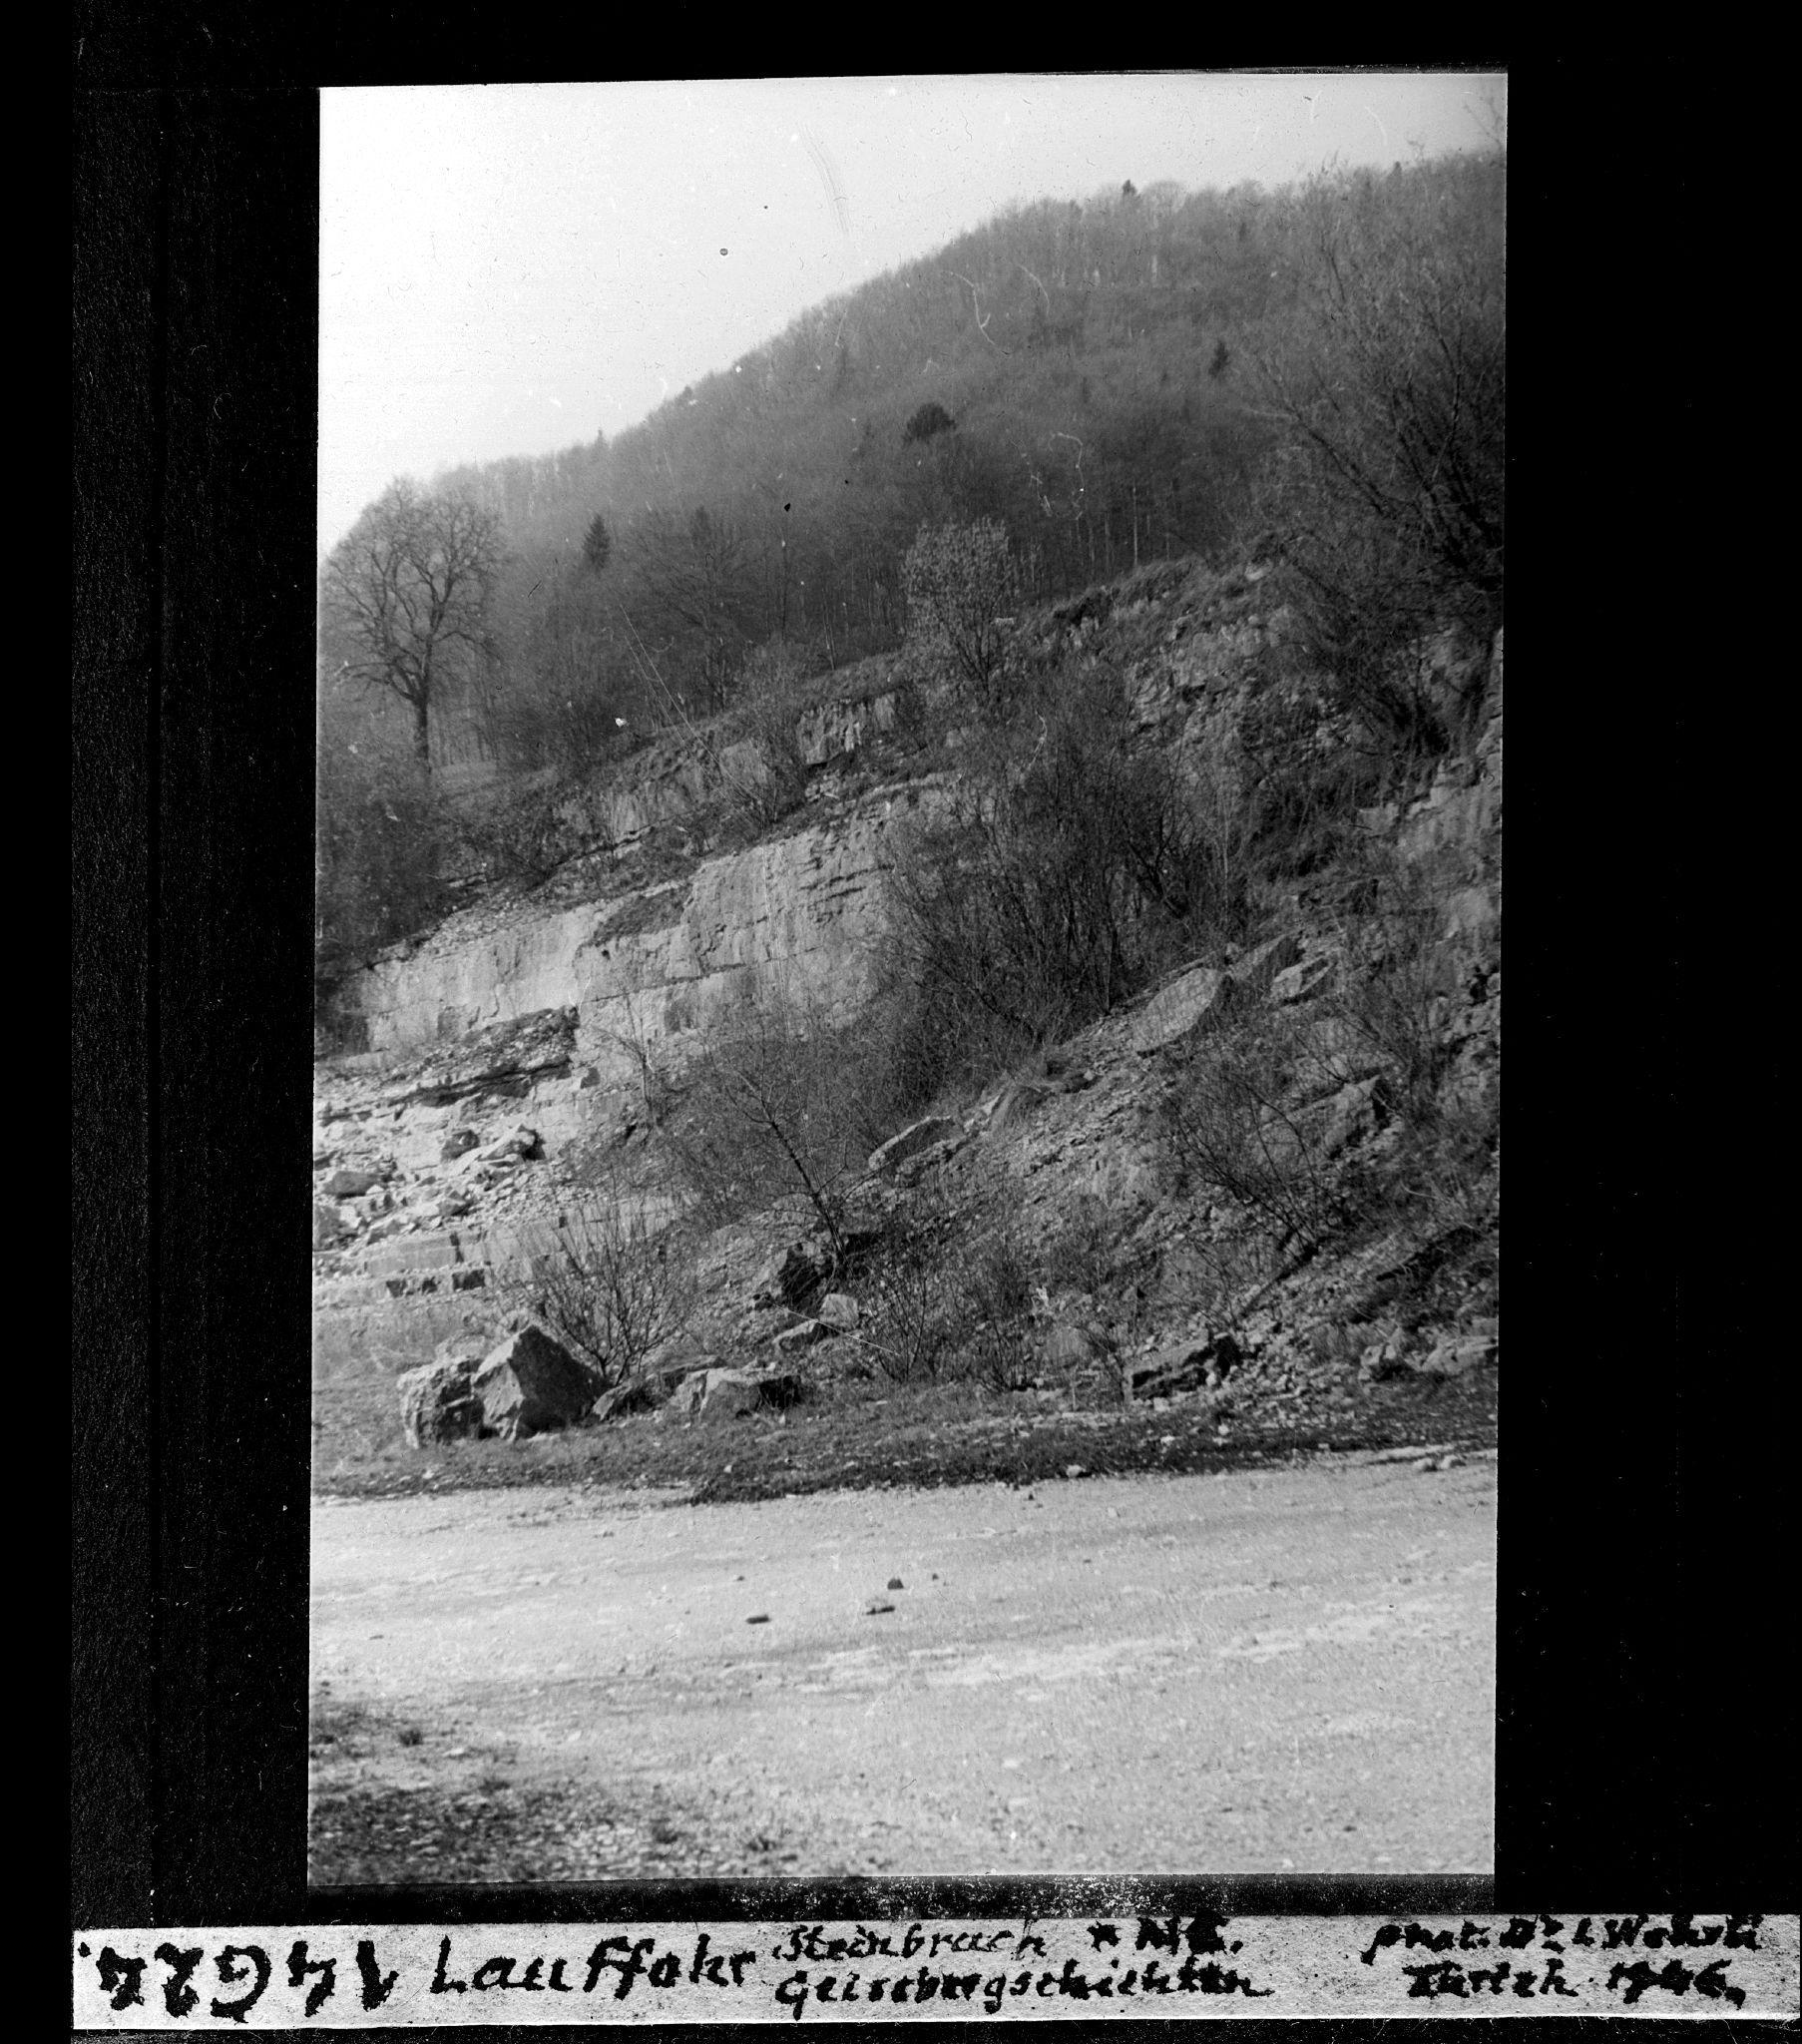 1946 - Steinbruch Lauffohr (Quelle: ETH-Bibliothek, e-pics.ethz.ch)